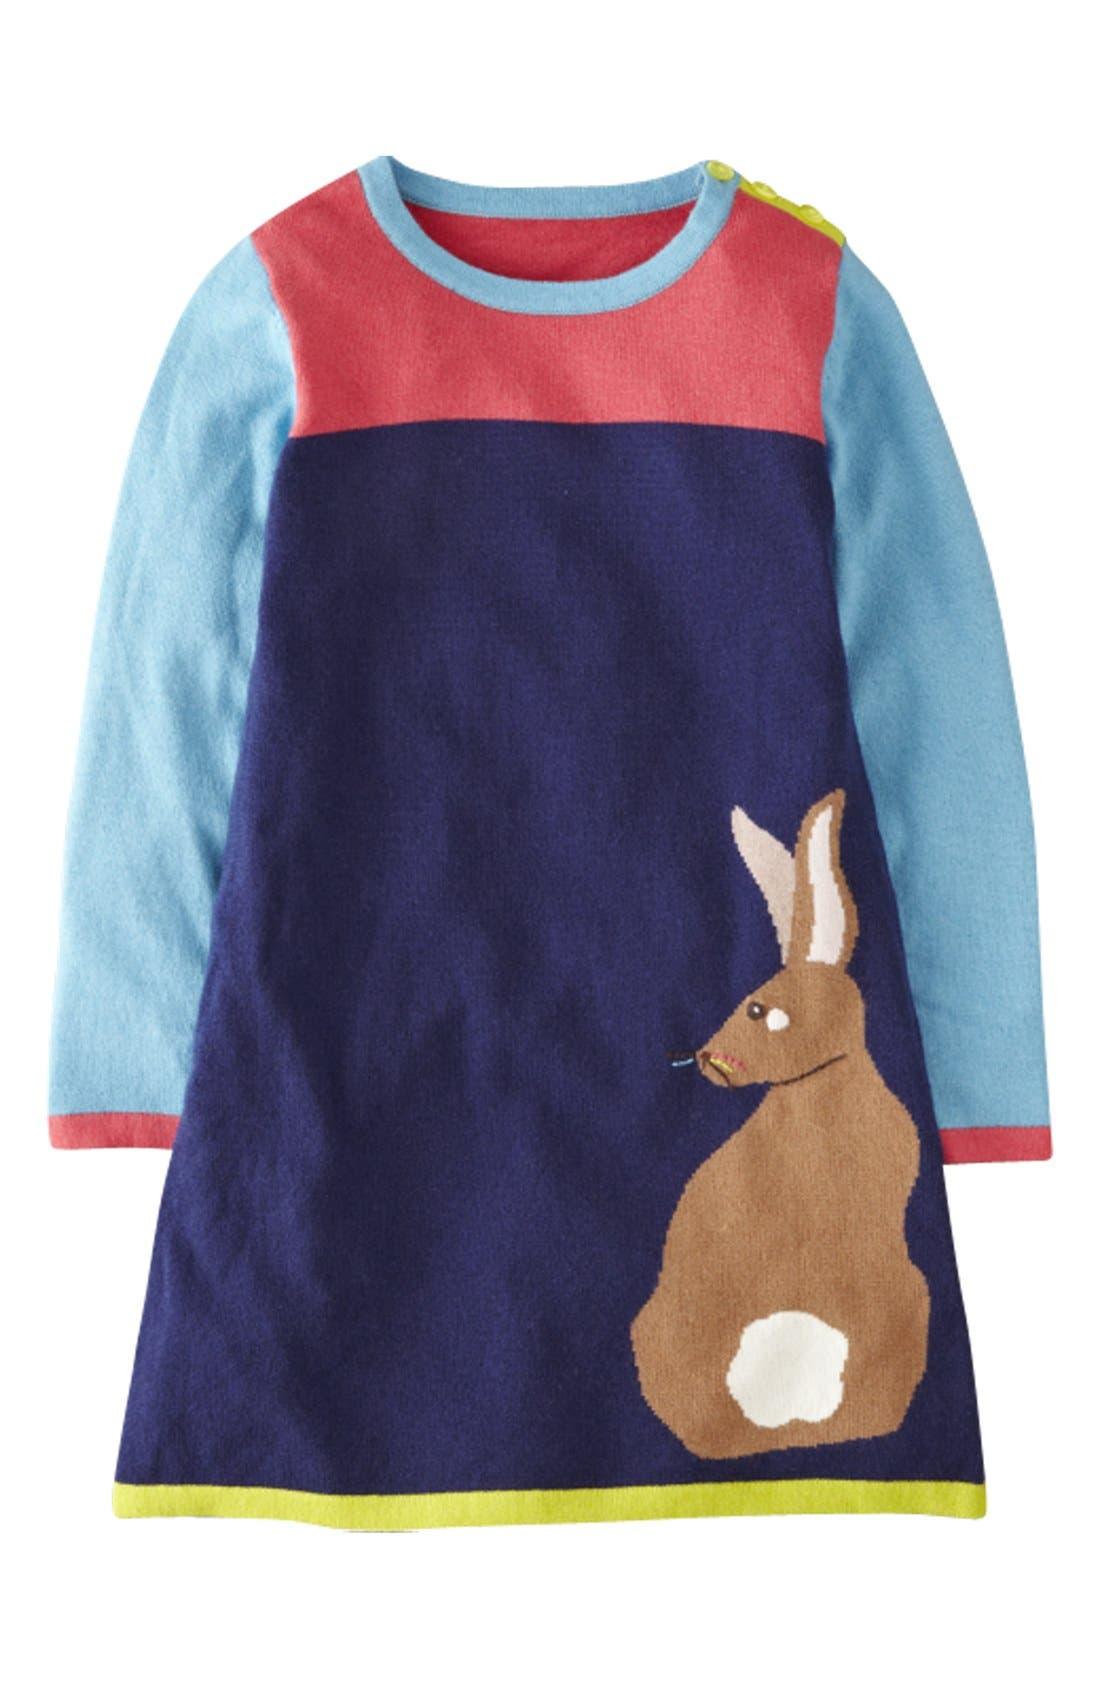 Alternate Image 1 Selected - Mini Boden 'Woodland' Knit Dress (Toddler Girls)